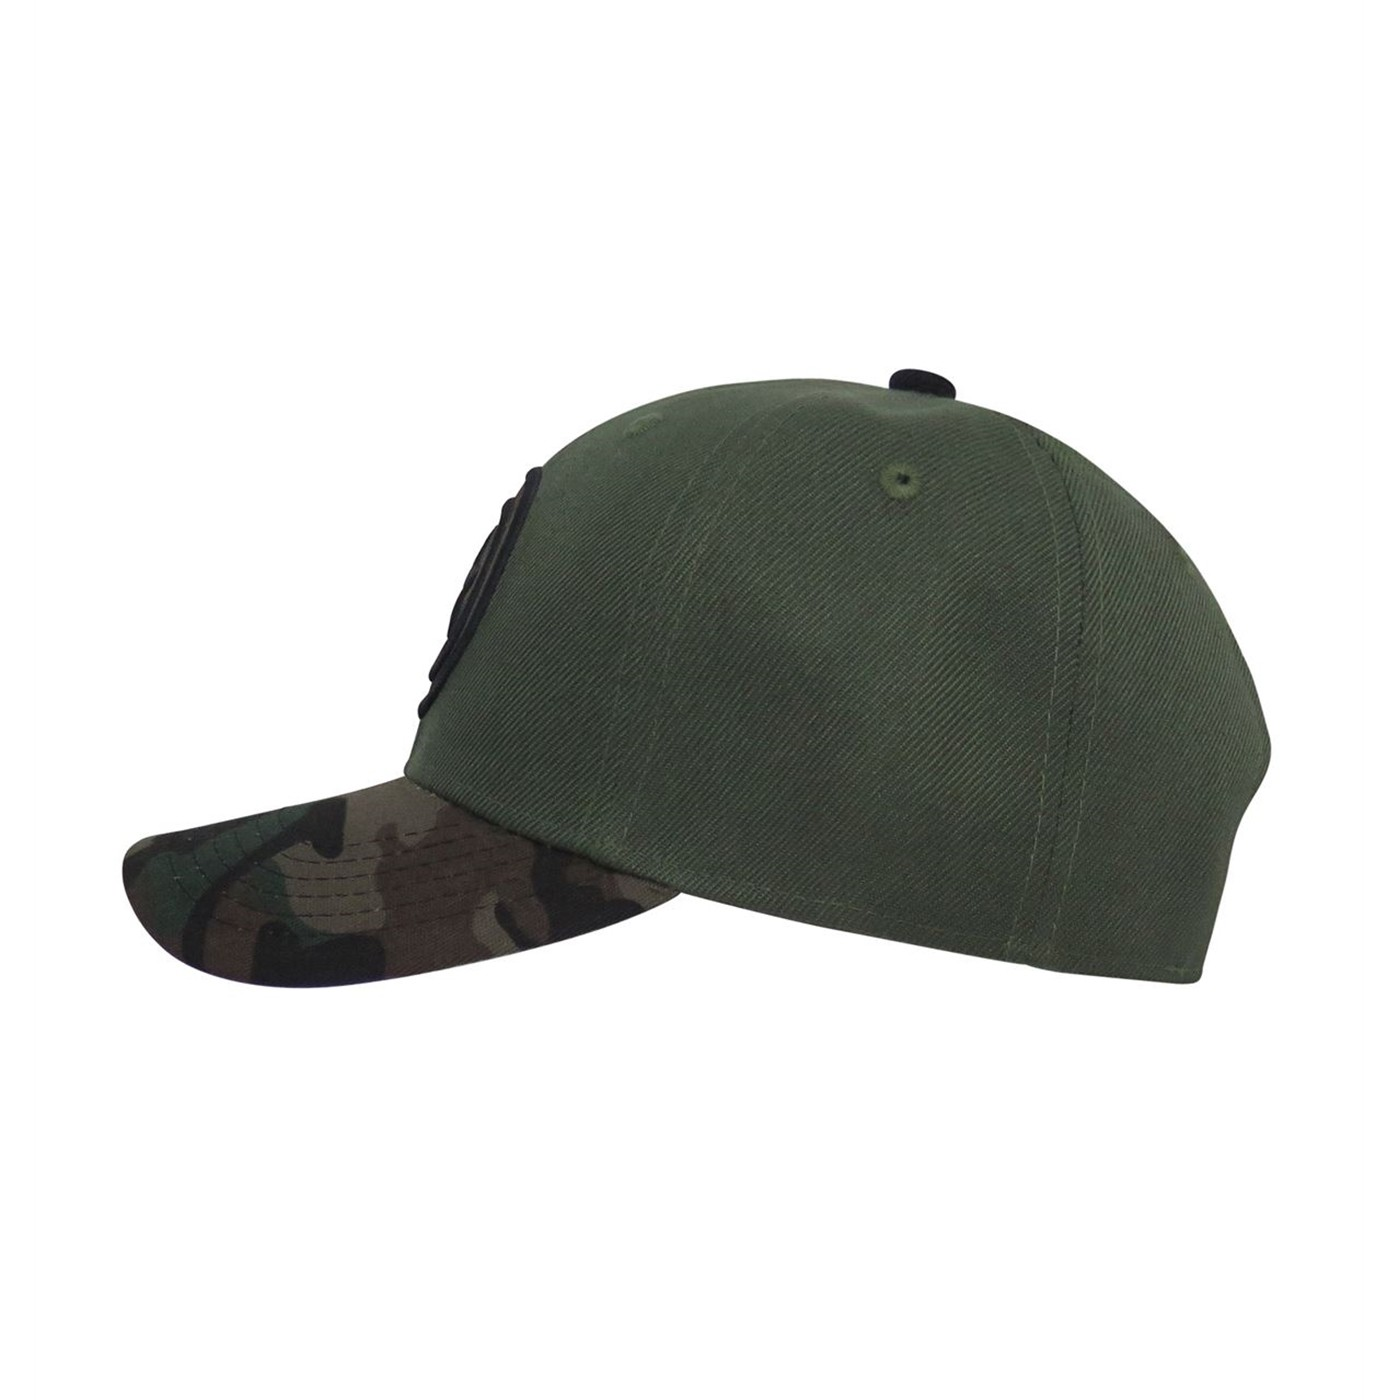 Captain America Camo Adjustable Snapback Hat